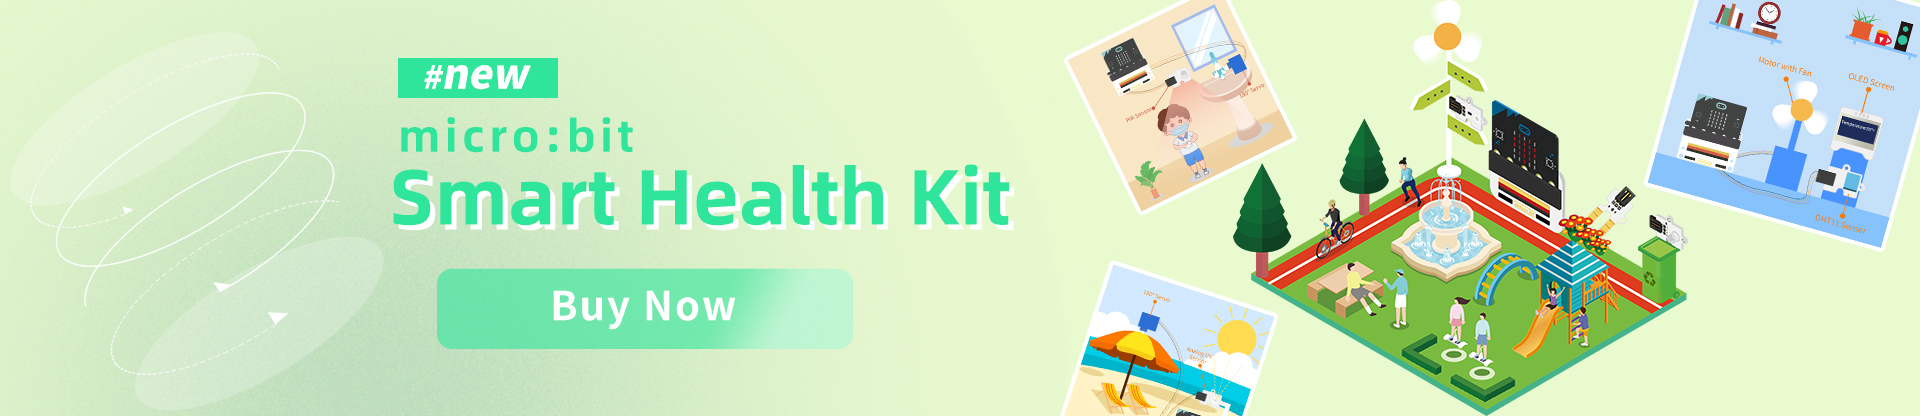 smart-health-kit